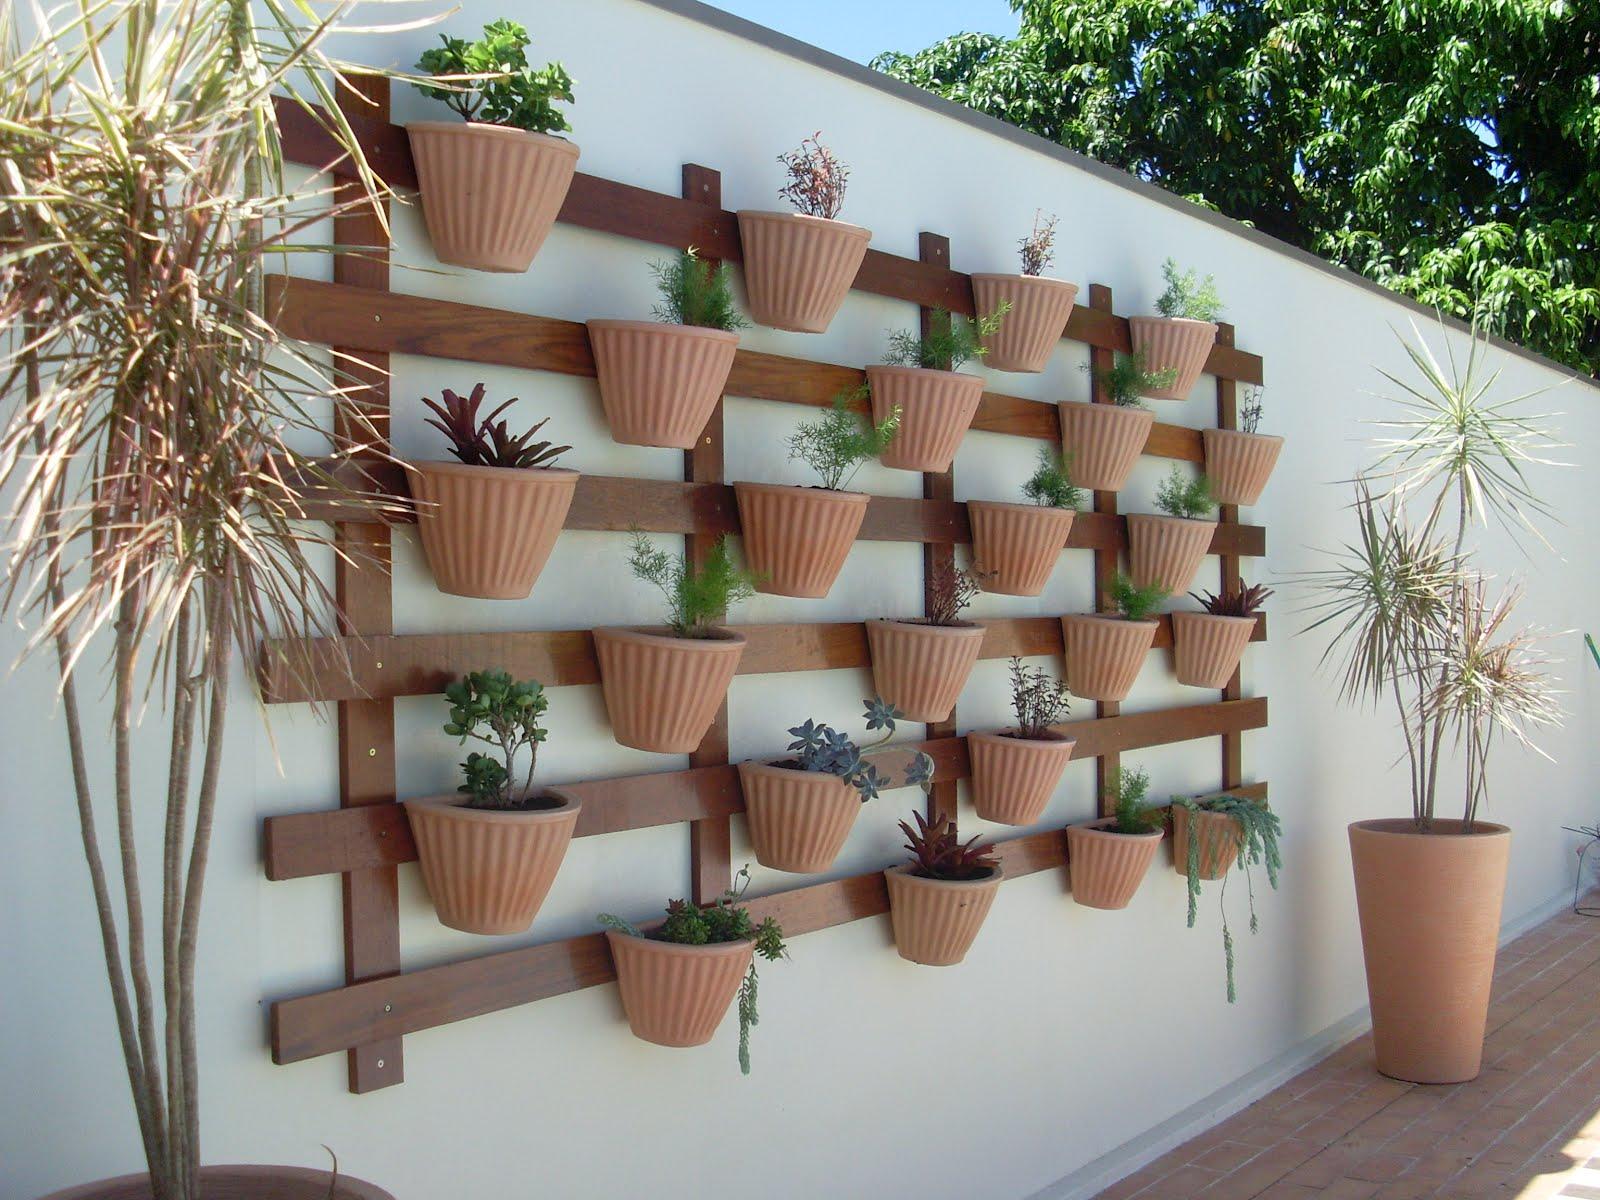 modelo-de-jardim-vertical